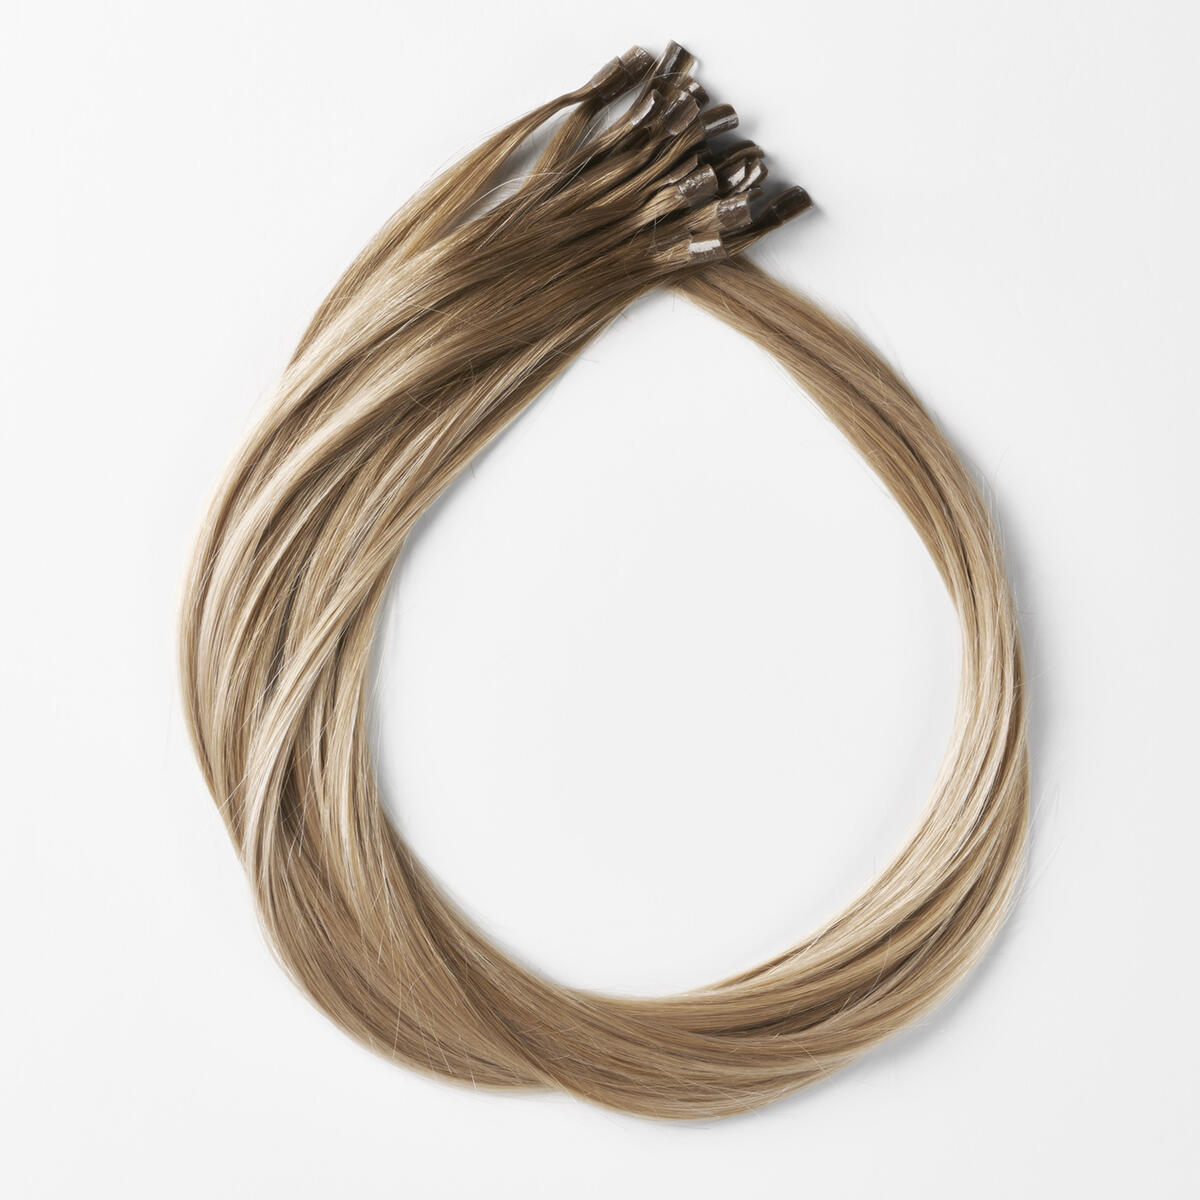 Bondings Premium Glatt B5.1/7.3 Brown Ash Blonde Balayage 50 cm